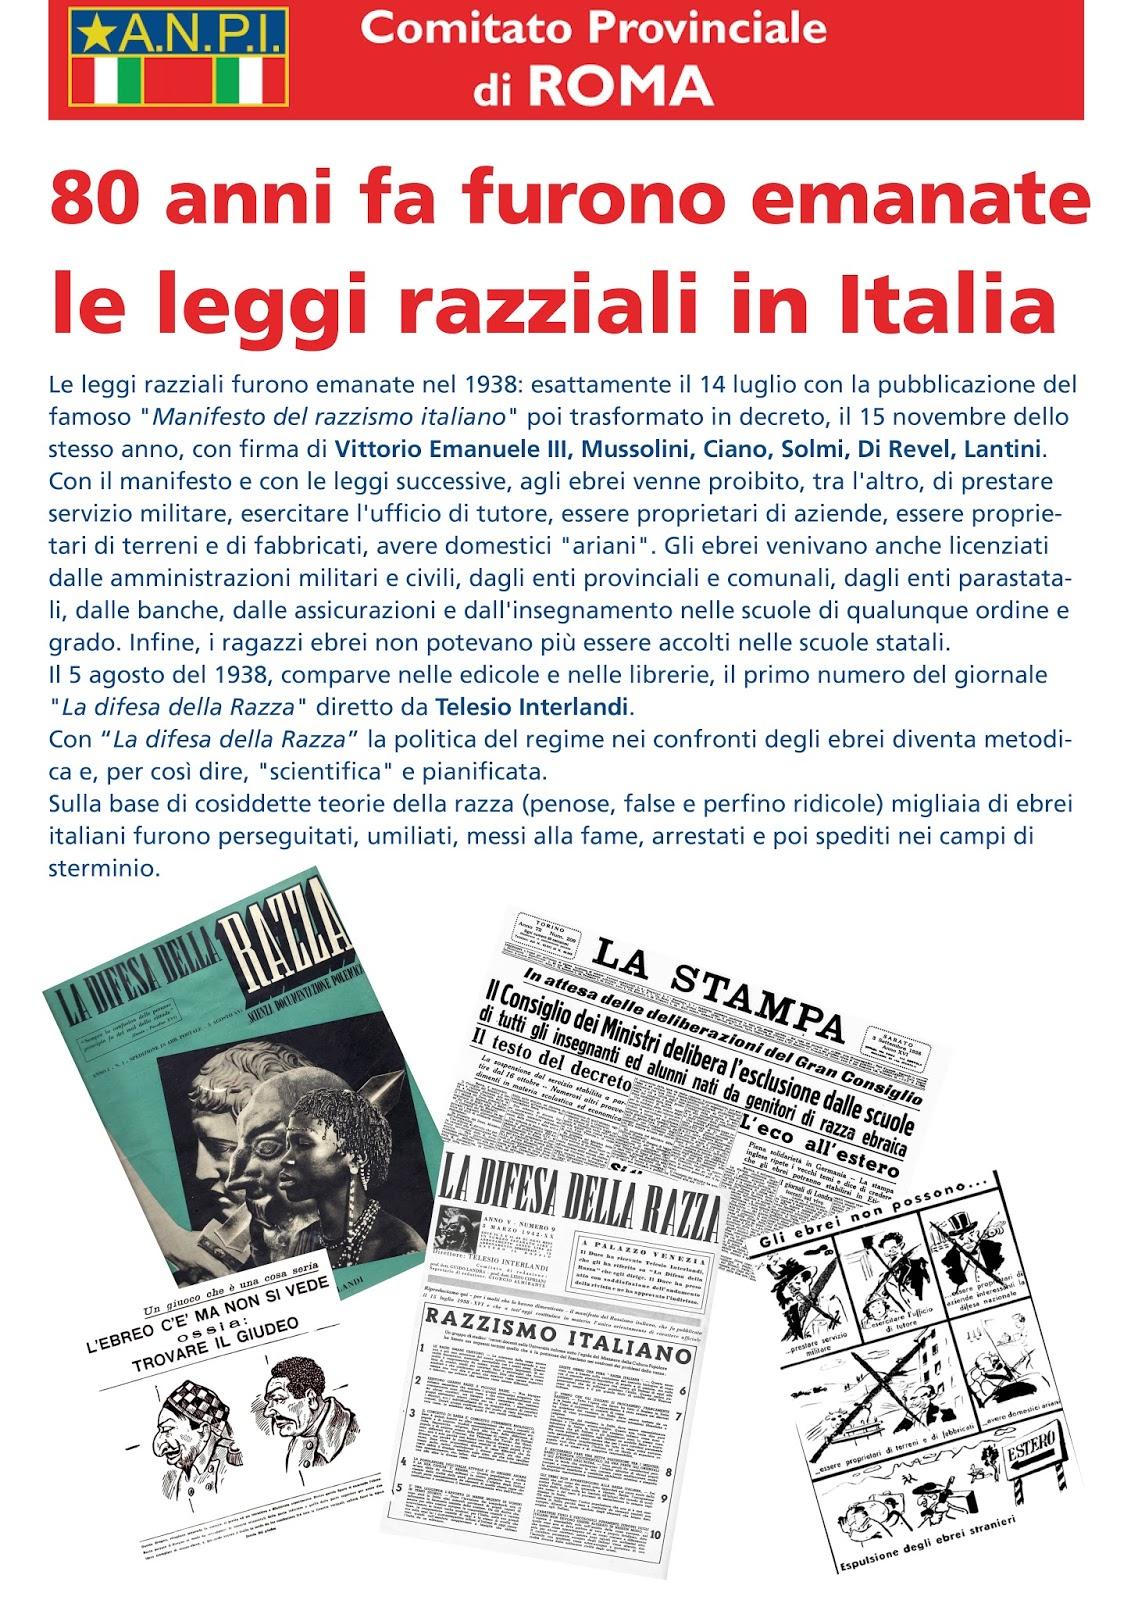 A n p i provinciale di roma 80 anni fa furono emanate le for Chi fa le leggi in italia